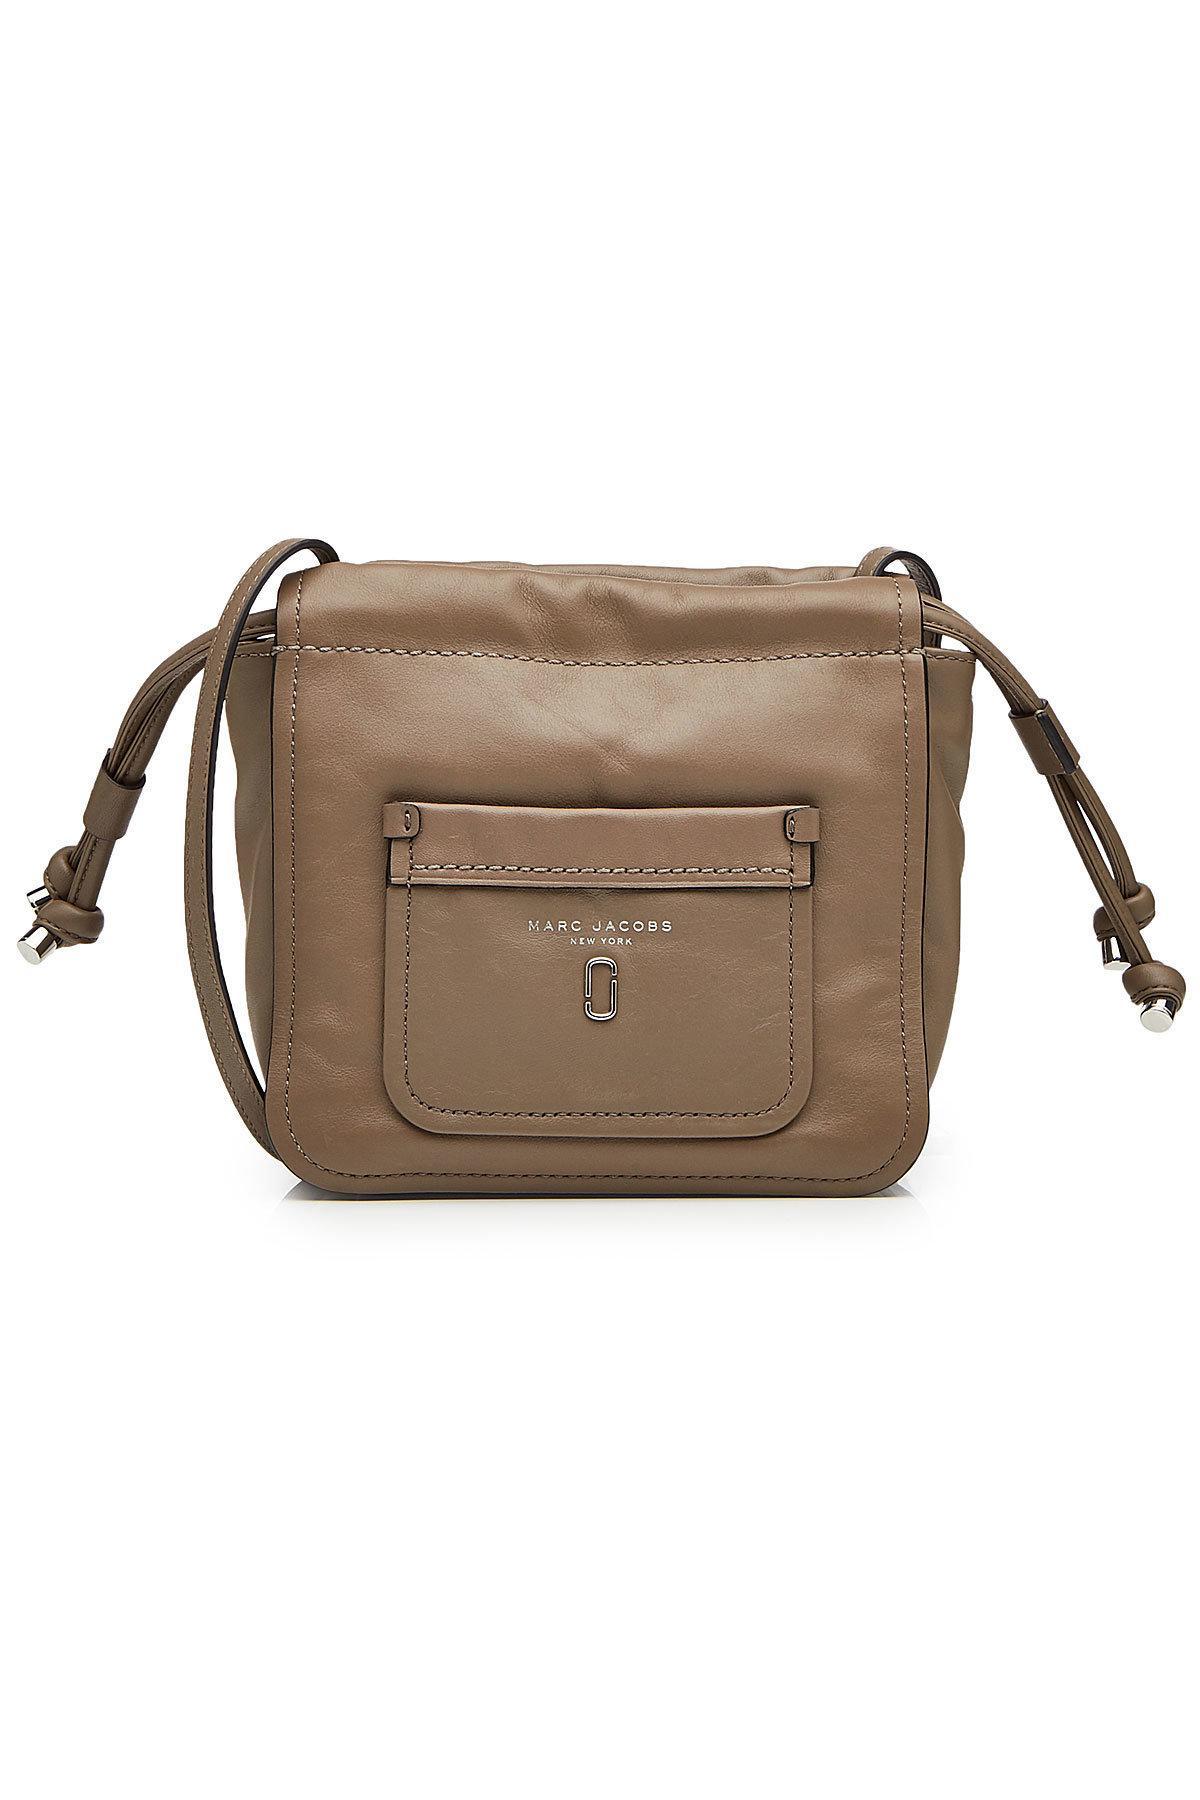 Marc Jacobs Leather Shoulder Bag In Brown